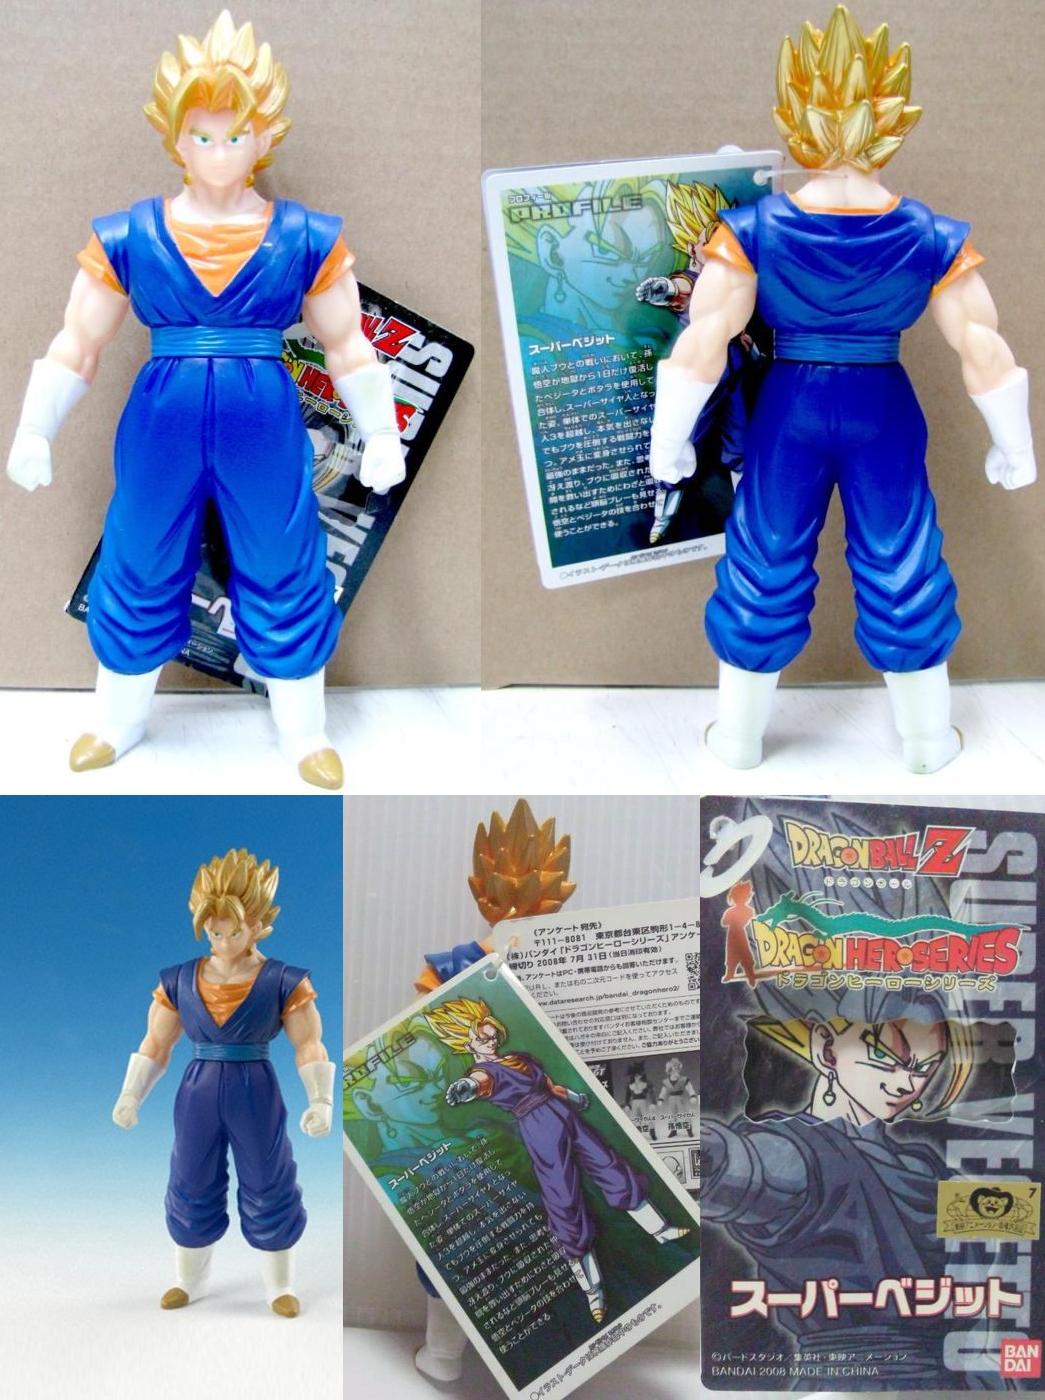 Bandai Dragon Ball Styling Trunks Dragon Ball Z Molded Figure Bandai Dragon Ball Styling Trunks Dragon Ball Z Molded Figure Bandai Shokugan /'/バ/ン/ダ/イ/' Mini-Figures